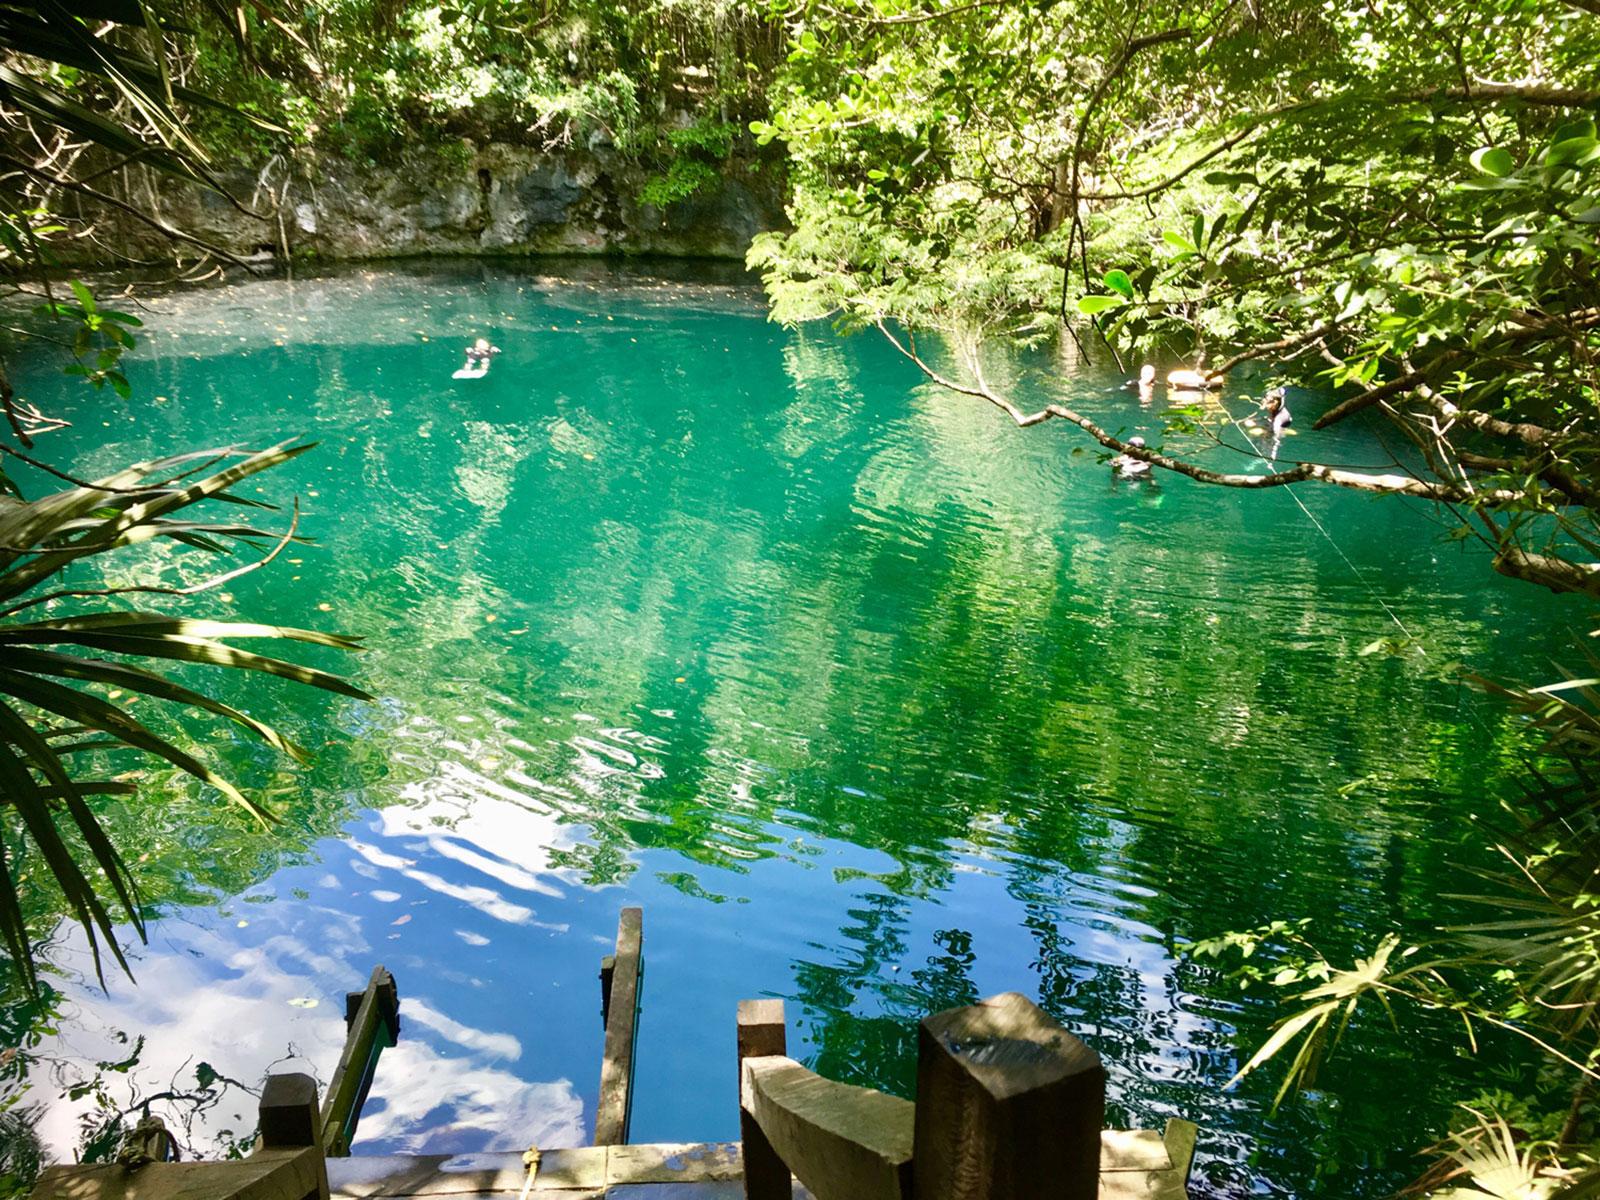 Maya_Luxe_Magazine_Riviera_Maya_Luxury_Villa_Rentals_Top_Cenotes_To_Visit_1.jpg